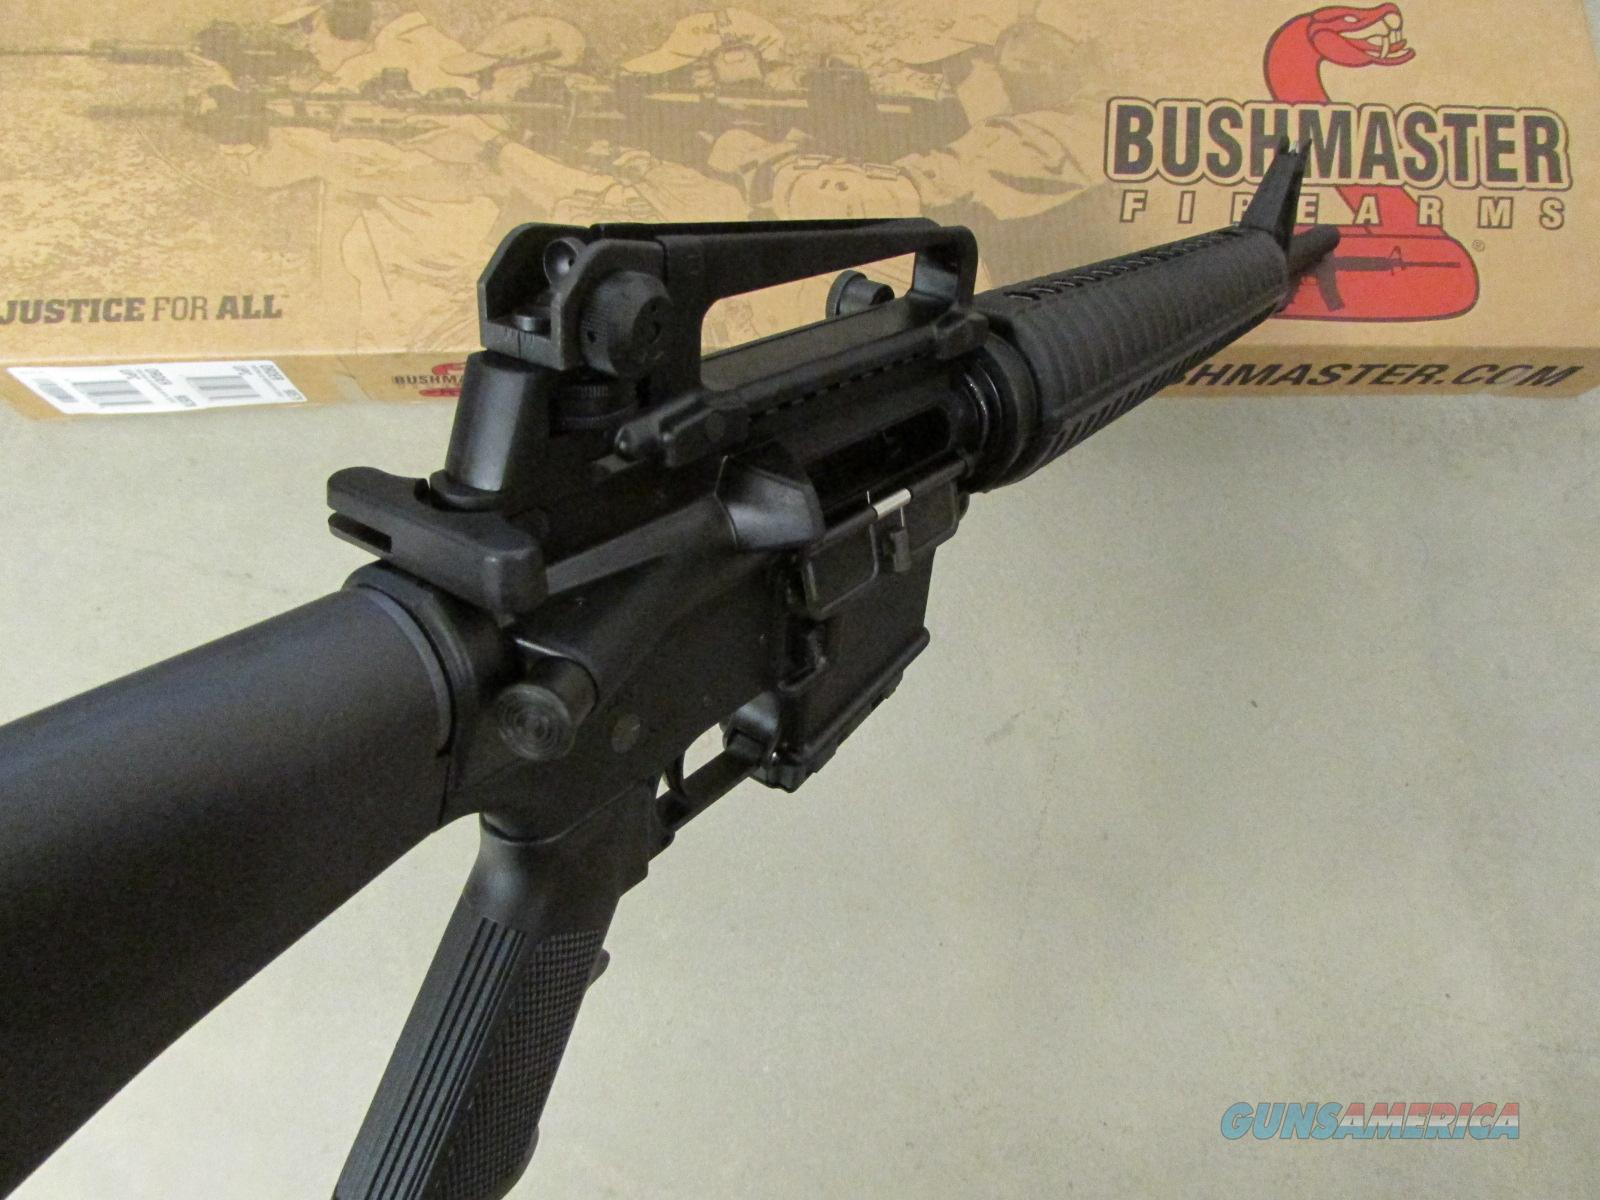 Bushmaster A3 Target 20